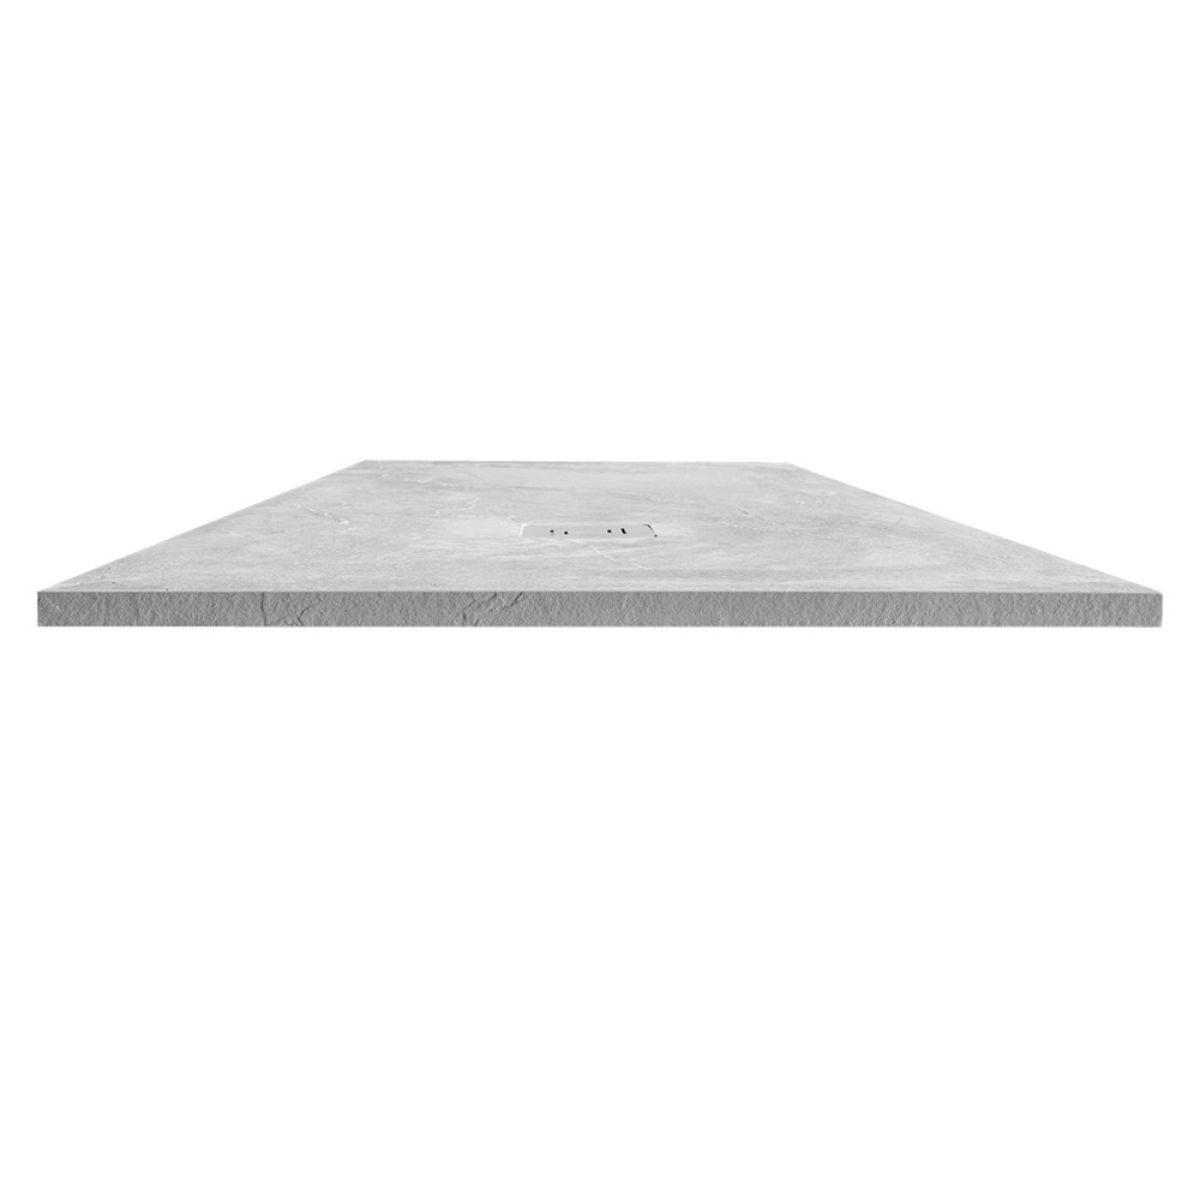 Merlyn Truestone Slate Black Rectangular Shower Tray 1700 x 900mm